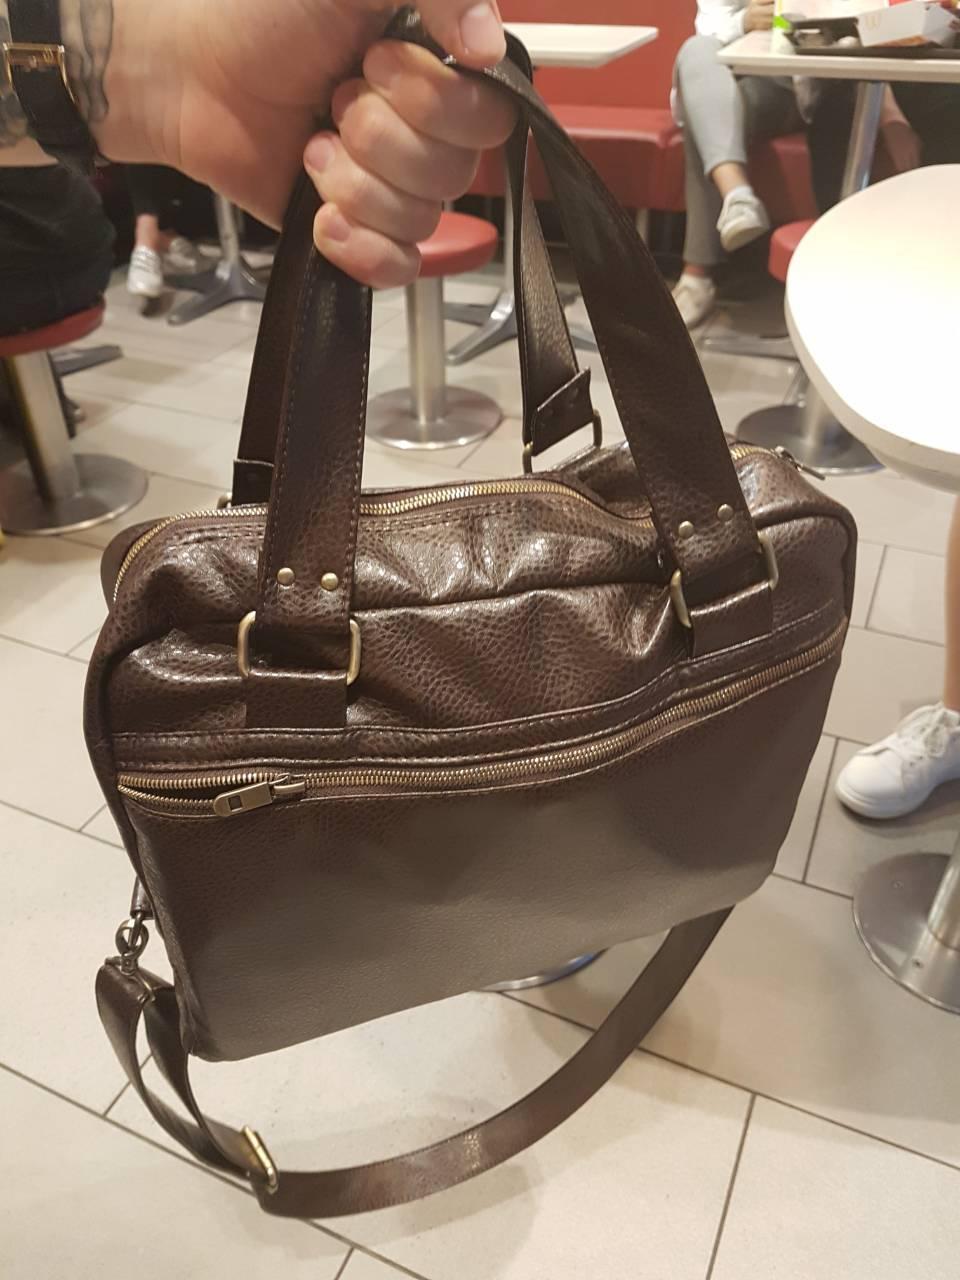 Мужская сумка v.1.0. Fisher Gifts коричневая (кожзам.)